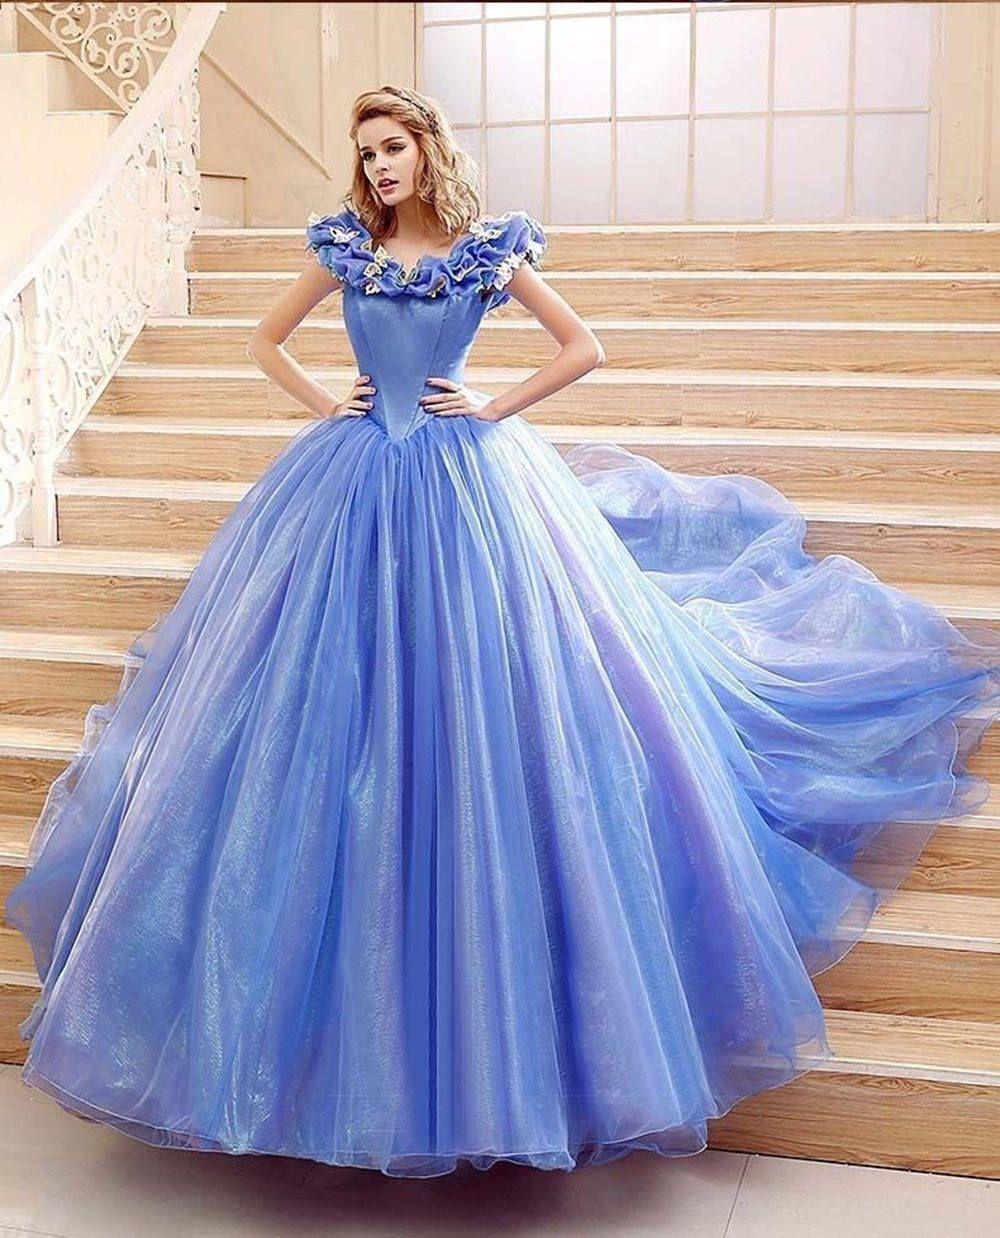 Movie Cinderella Cosplay Dress For Adult Fancy Princess Vintage blue prom Dress